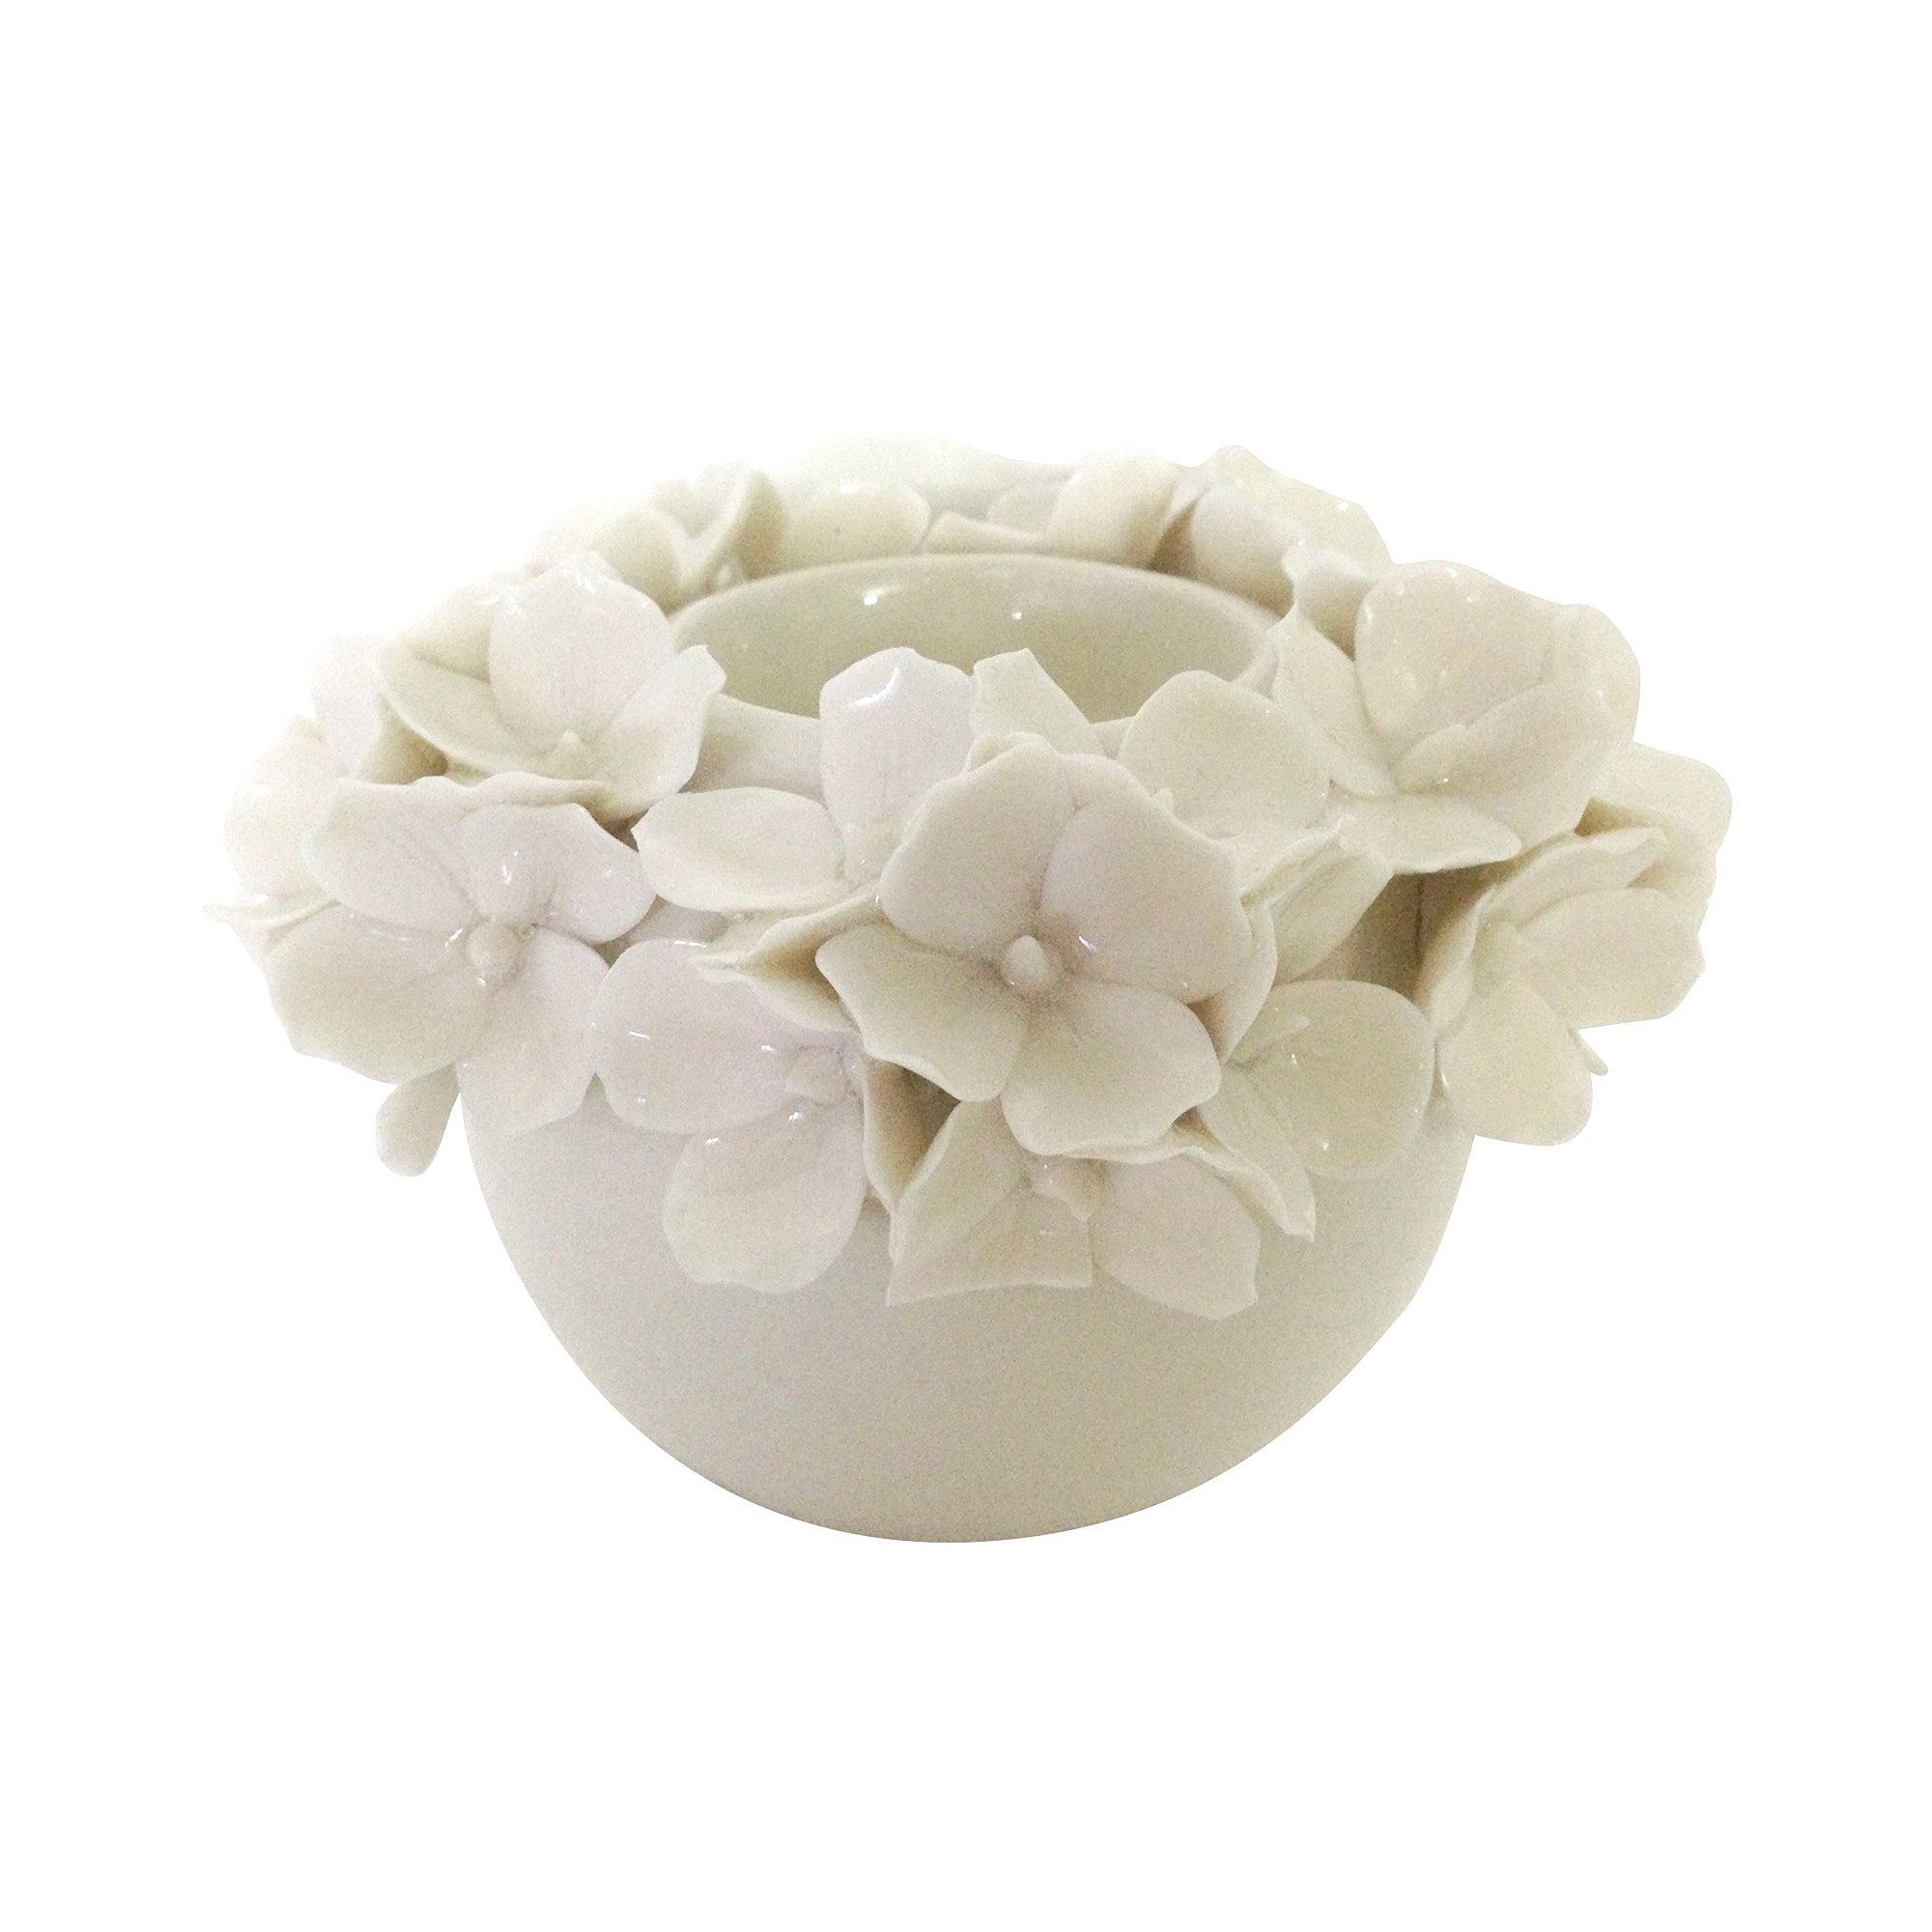 Image of Dorma Cream Flower Tealight Holder Cream